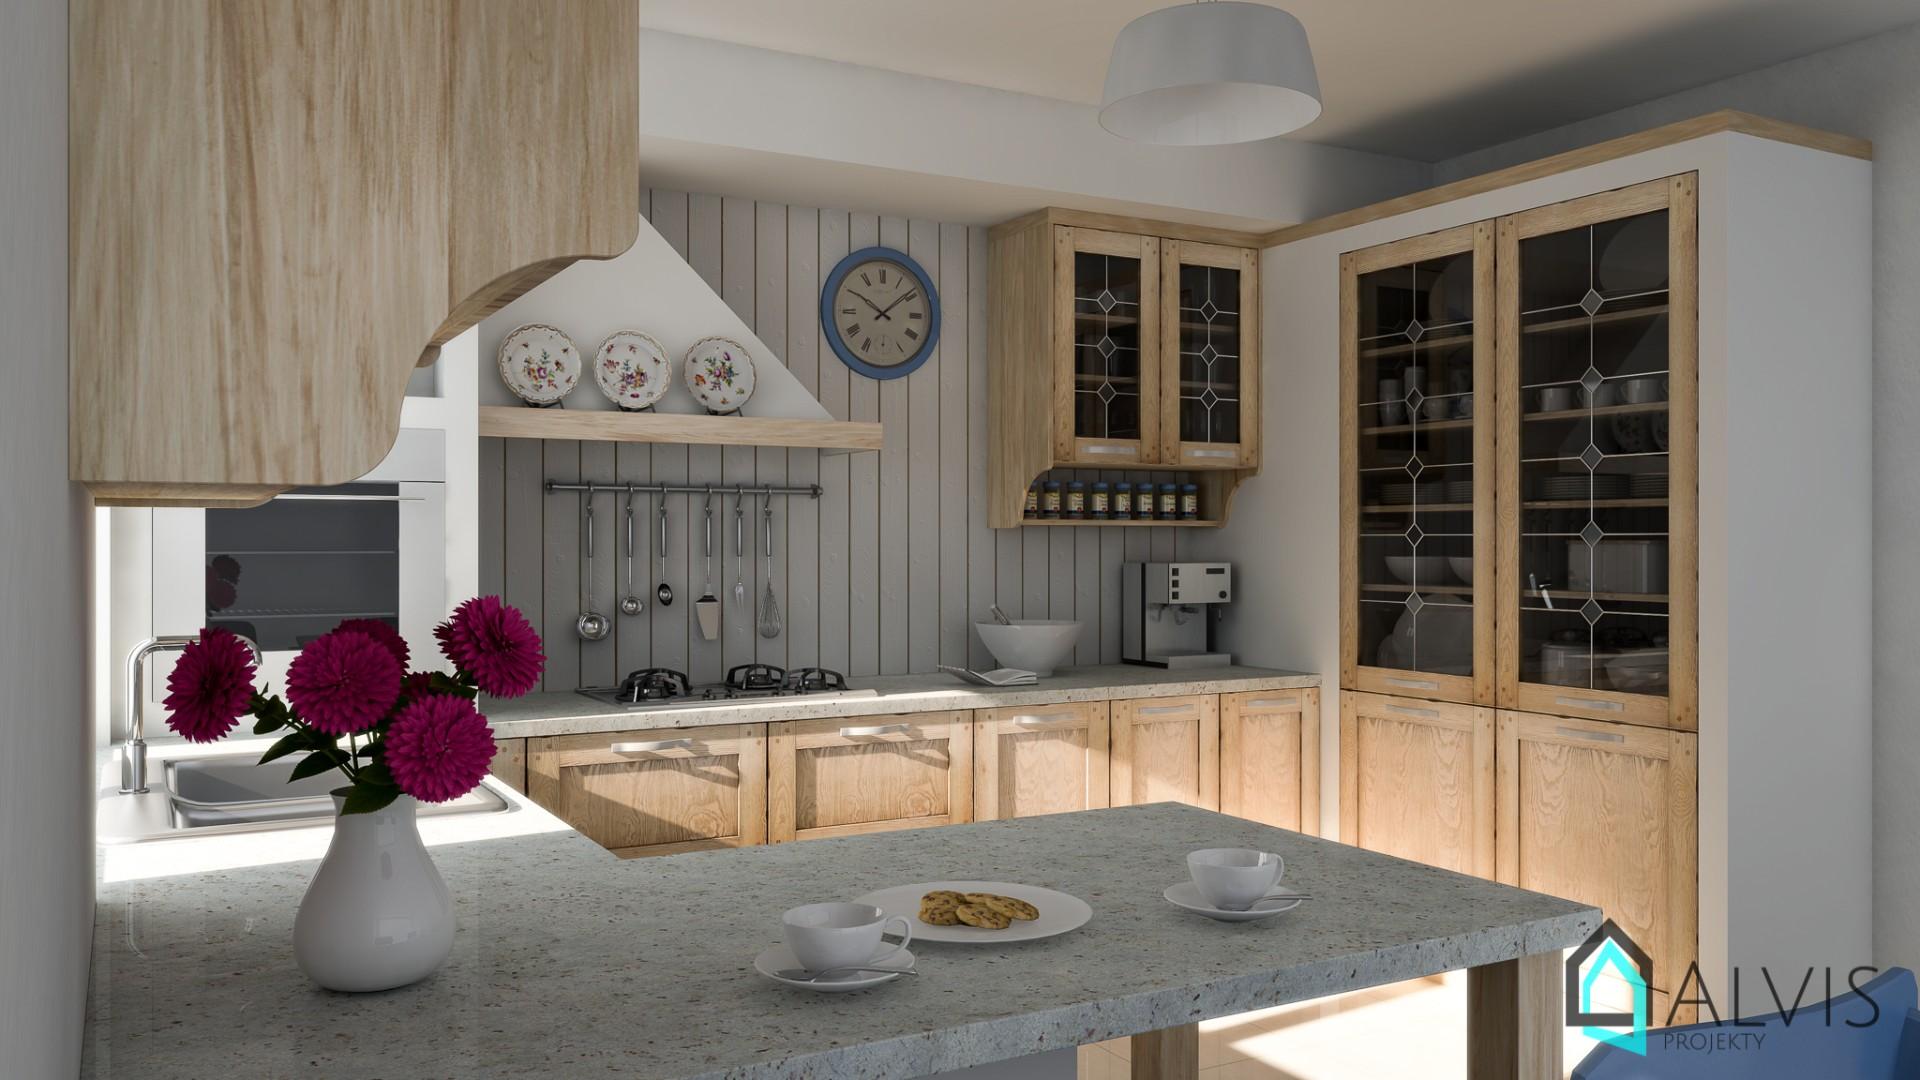 projekty-alvis-kuchnia-sosna-2-of-5-20170530.jpg